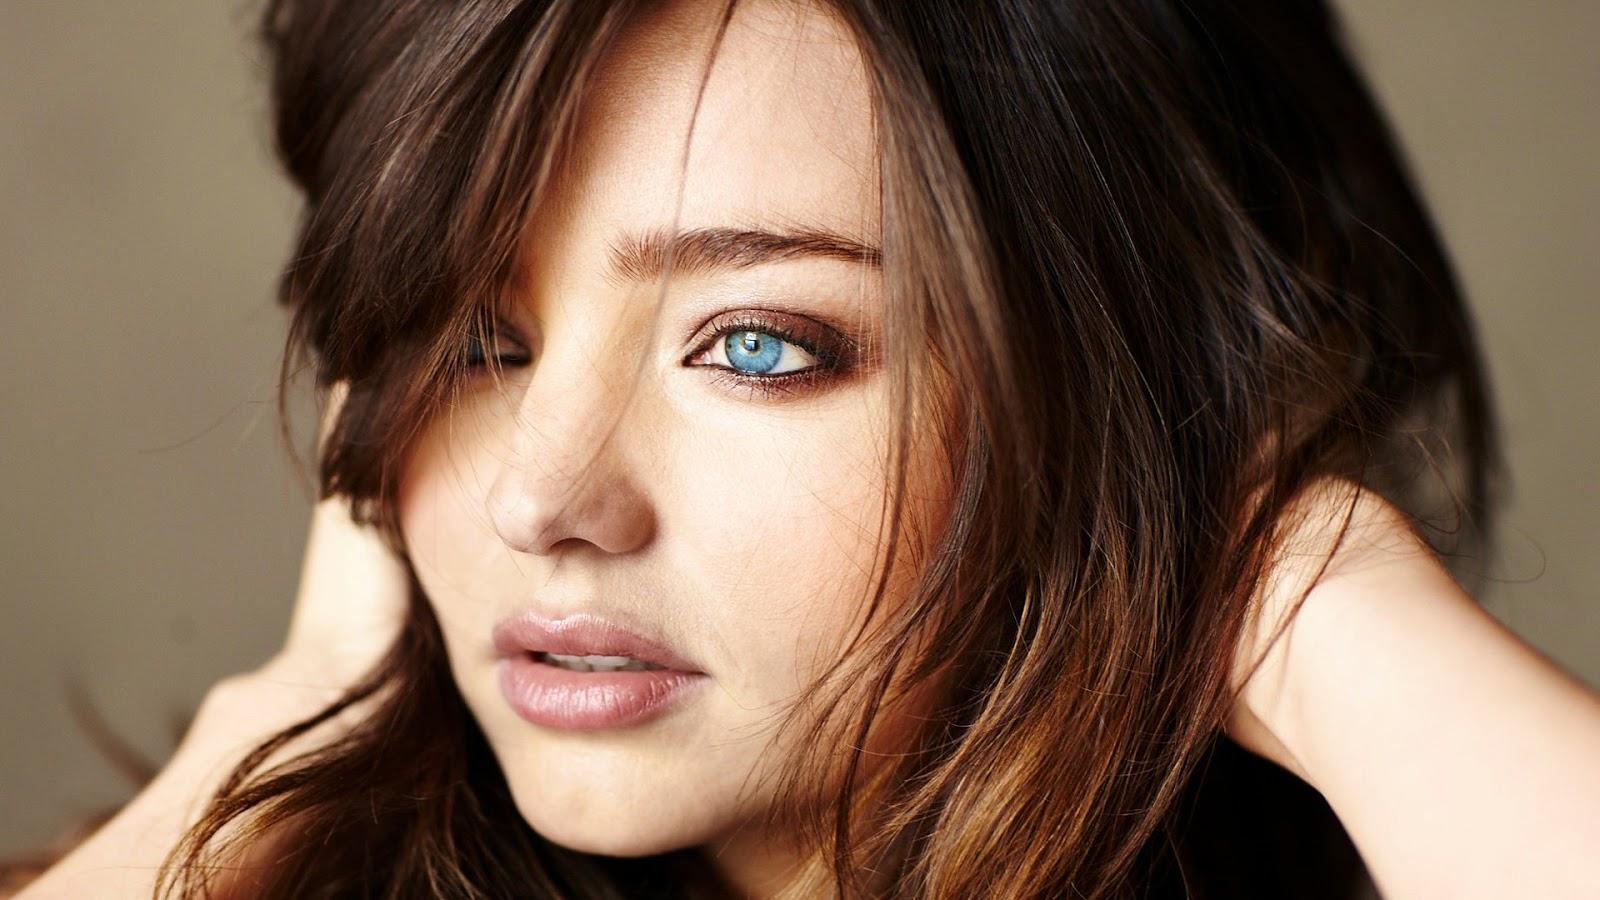 Best Pics Store: Celebrities HD Wallpapers Free Download